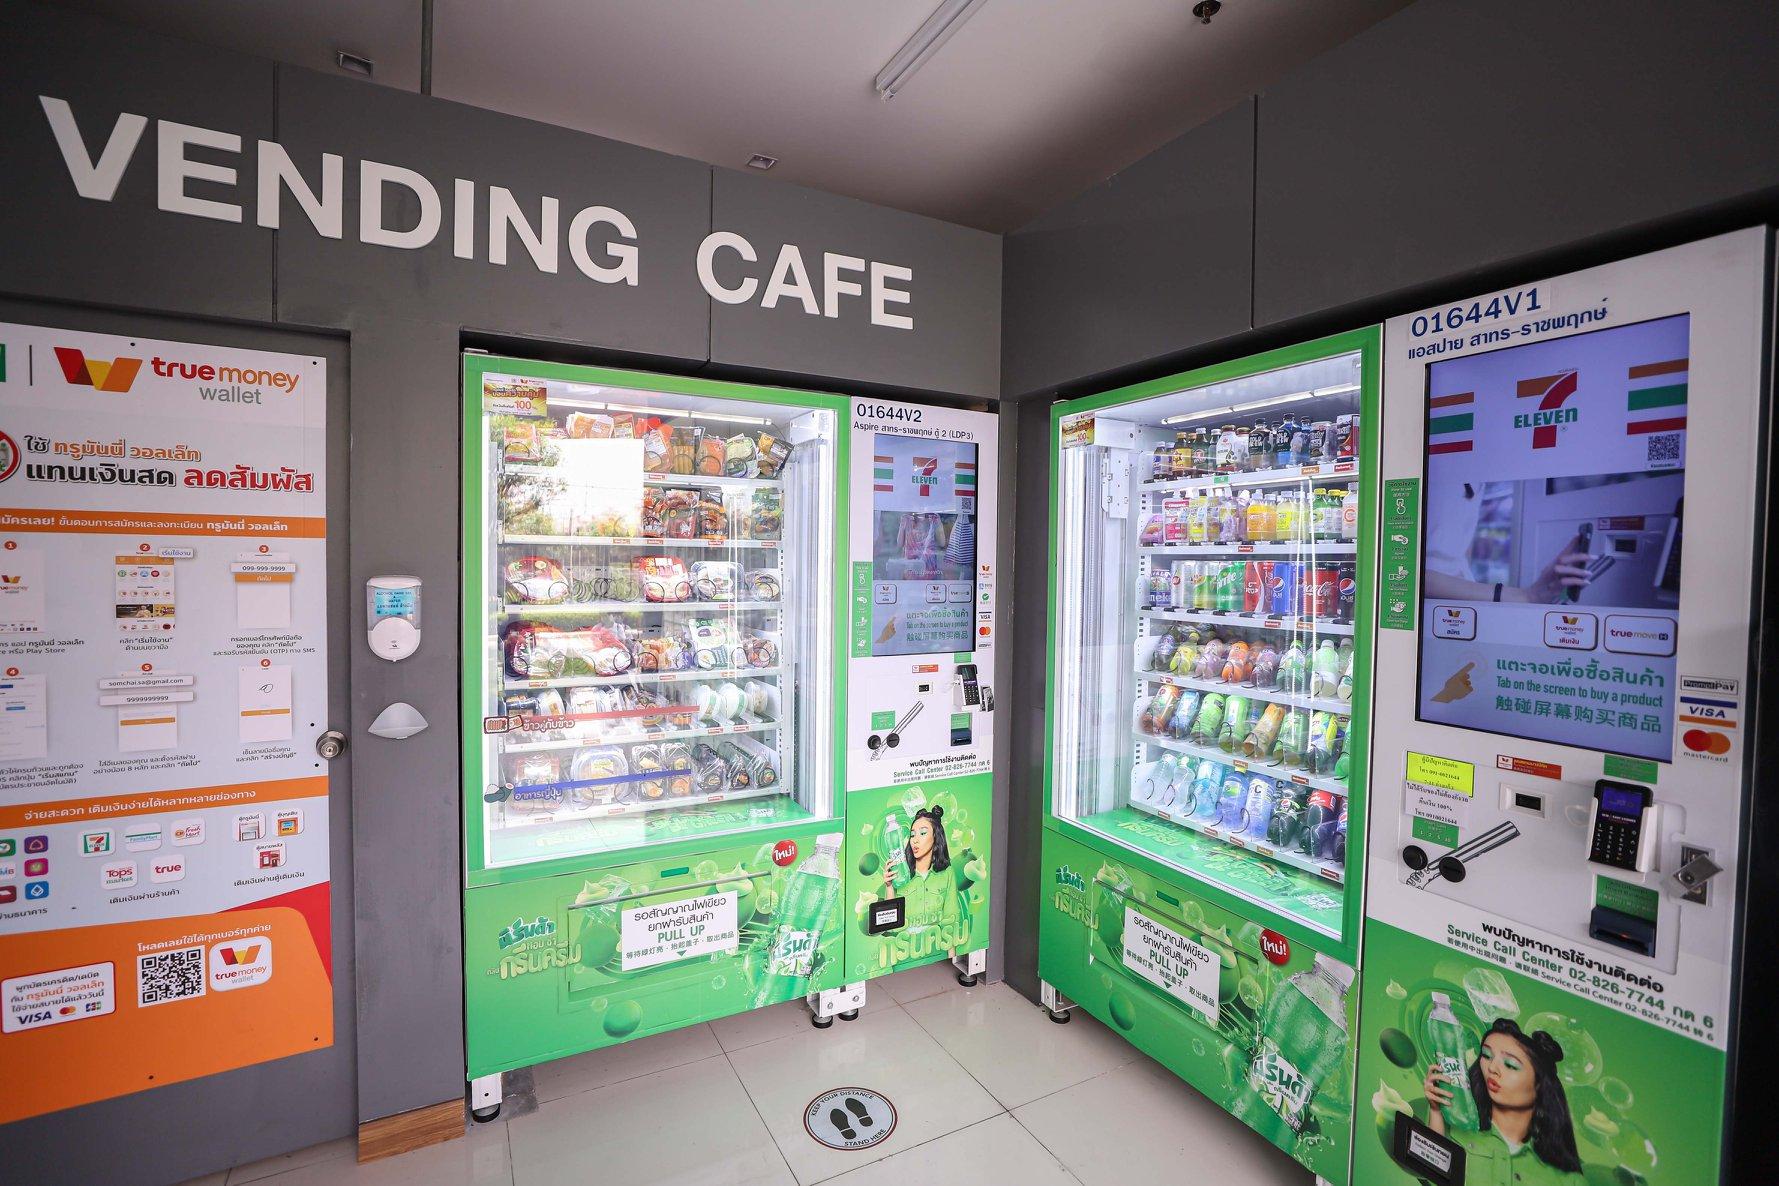 7-Eleven Vending Cafe Thailand